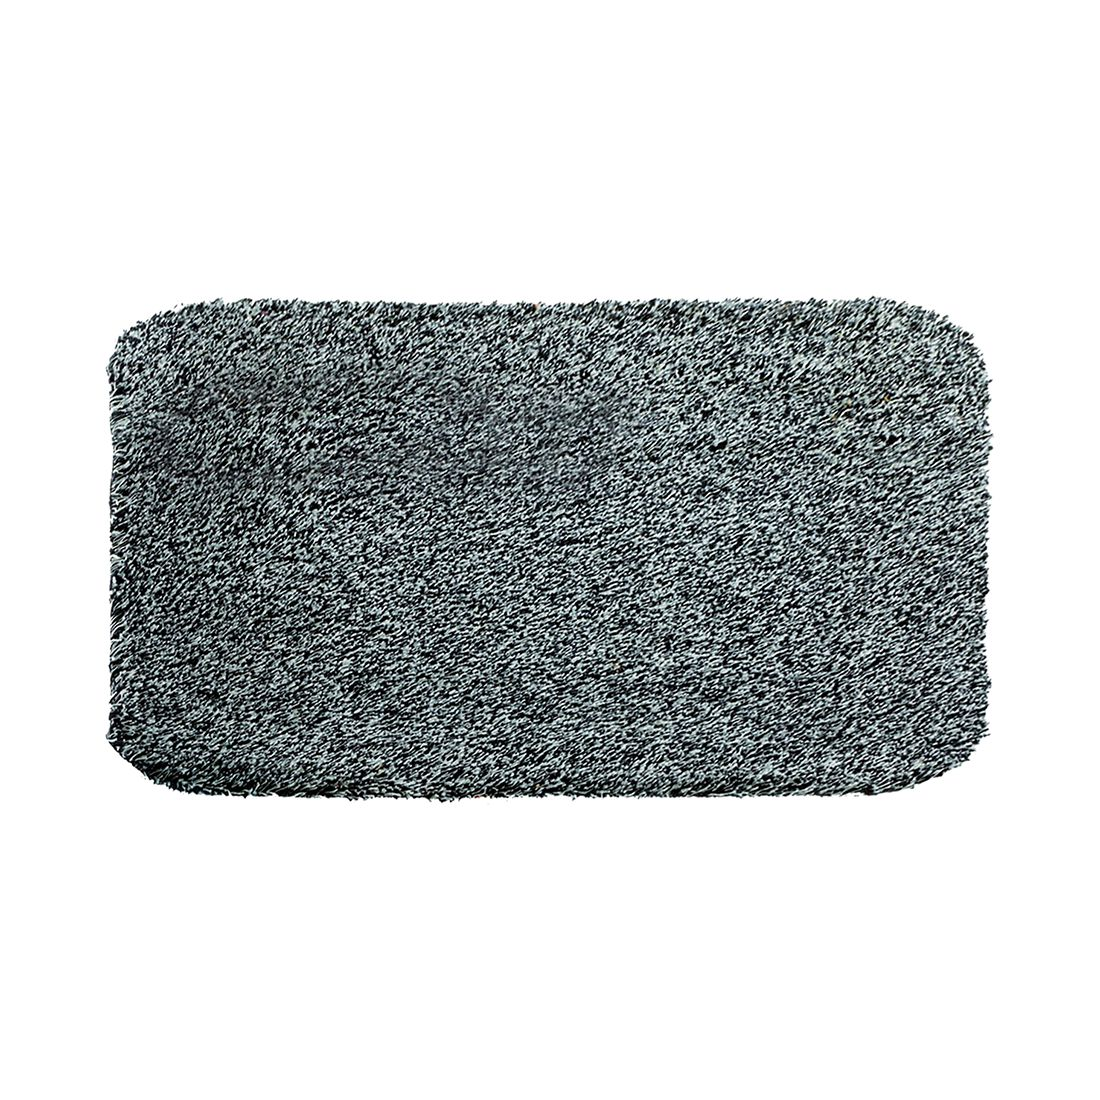 Fußmatte ASTRA Saugaktiv - Anthrazit - 90 x 150 cm, Astra